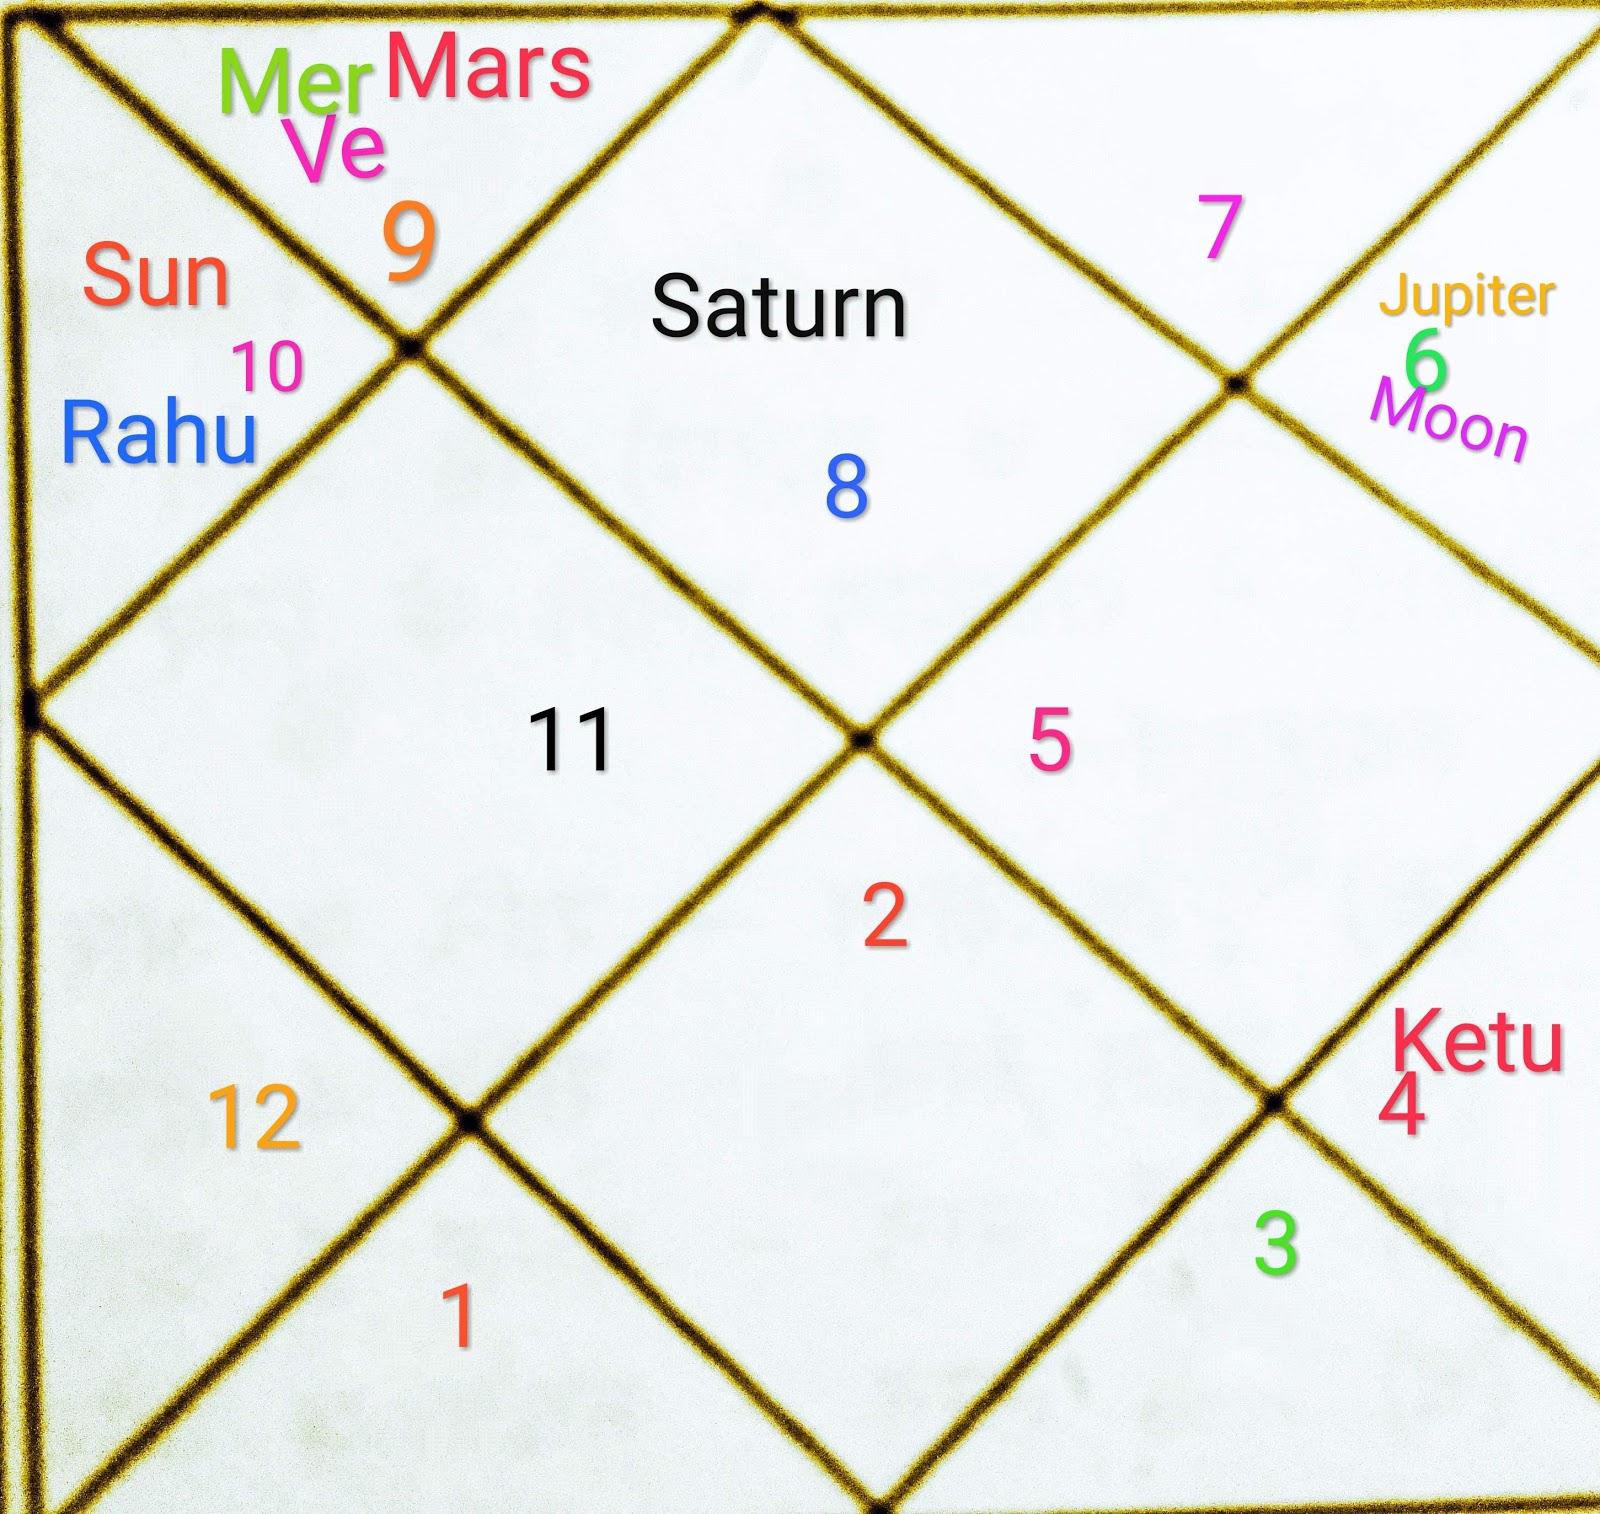 Kaal sarp yoga and Kaal sarp dosha: January 2013